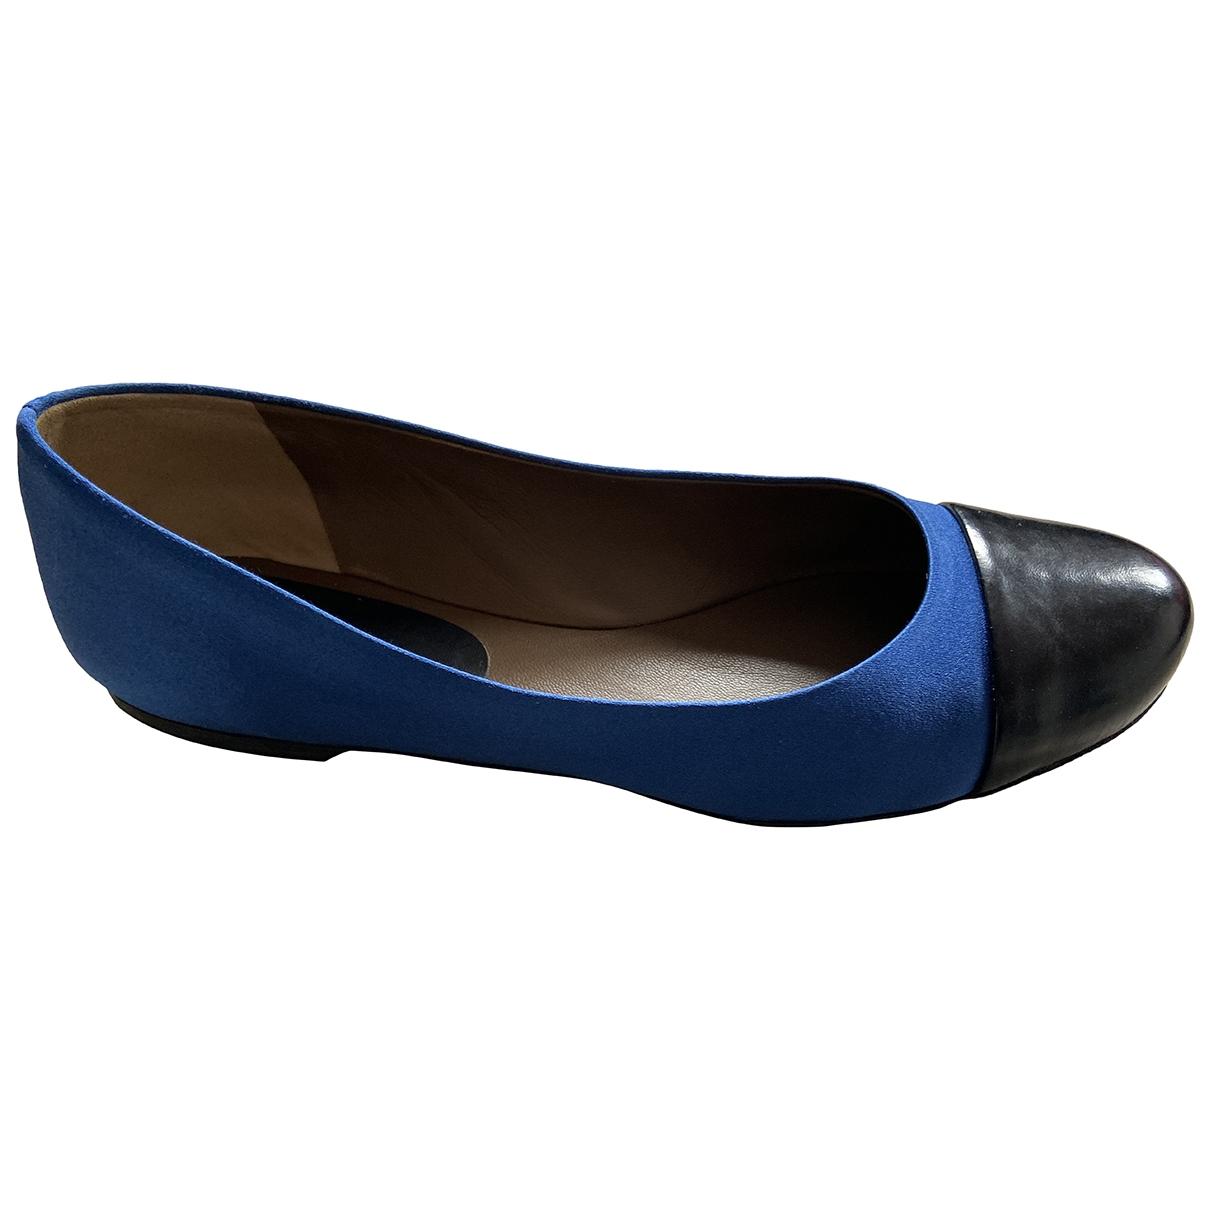 Marni \N Ballerinas in  Blau Leder